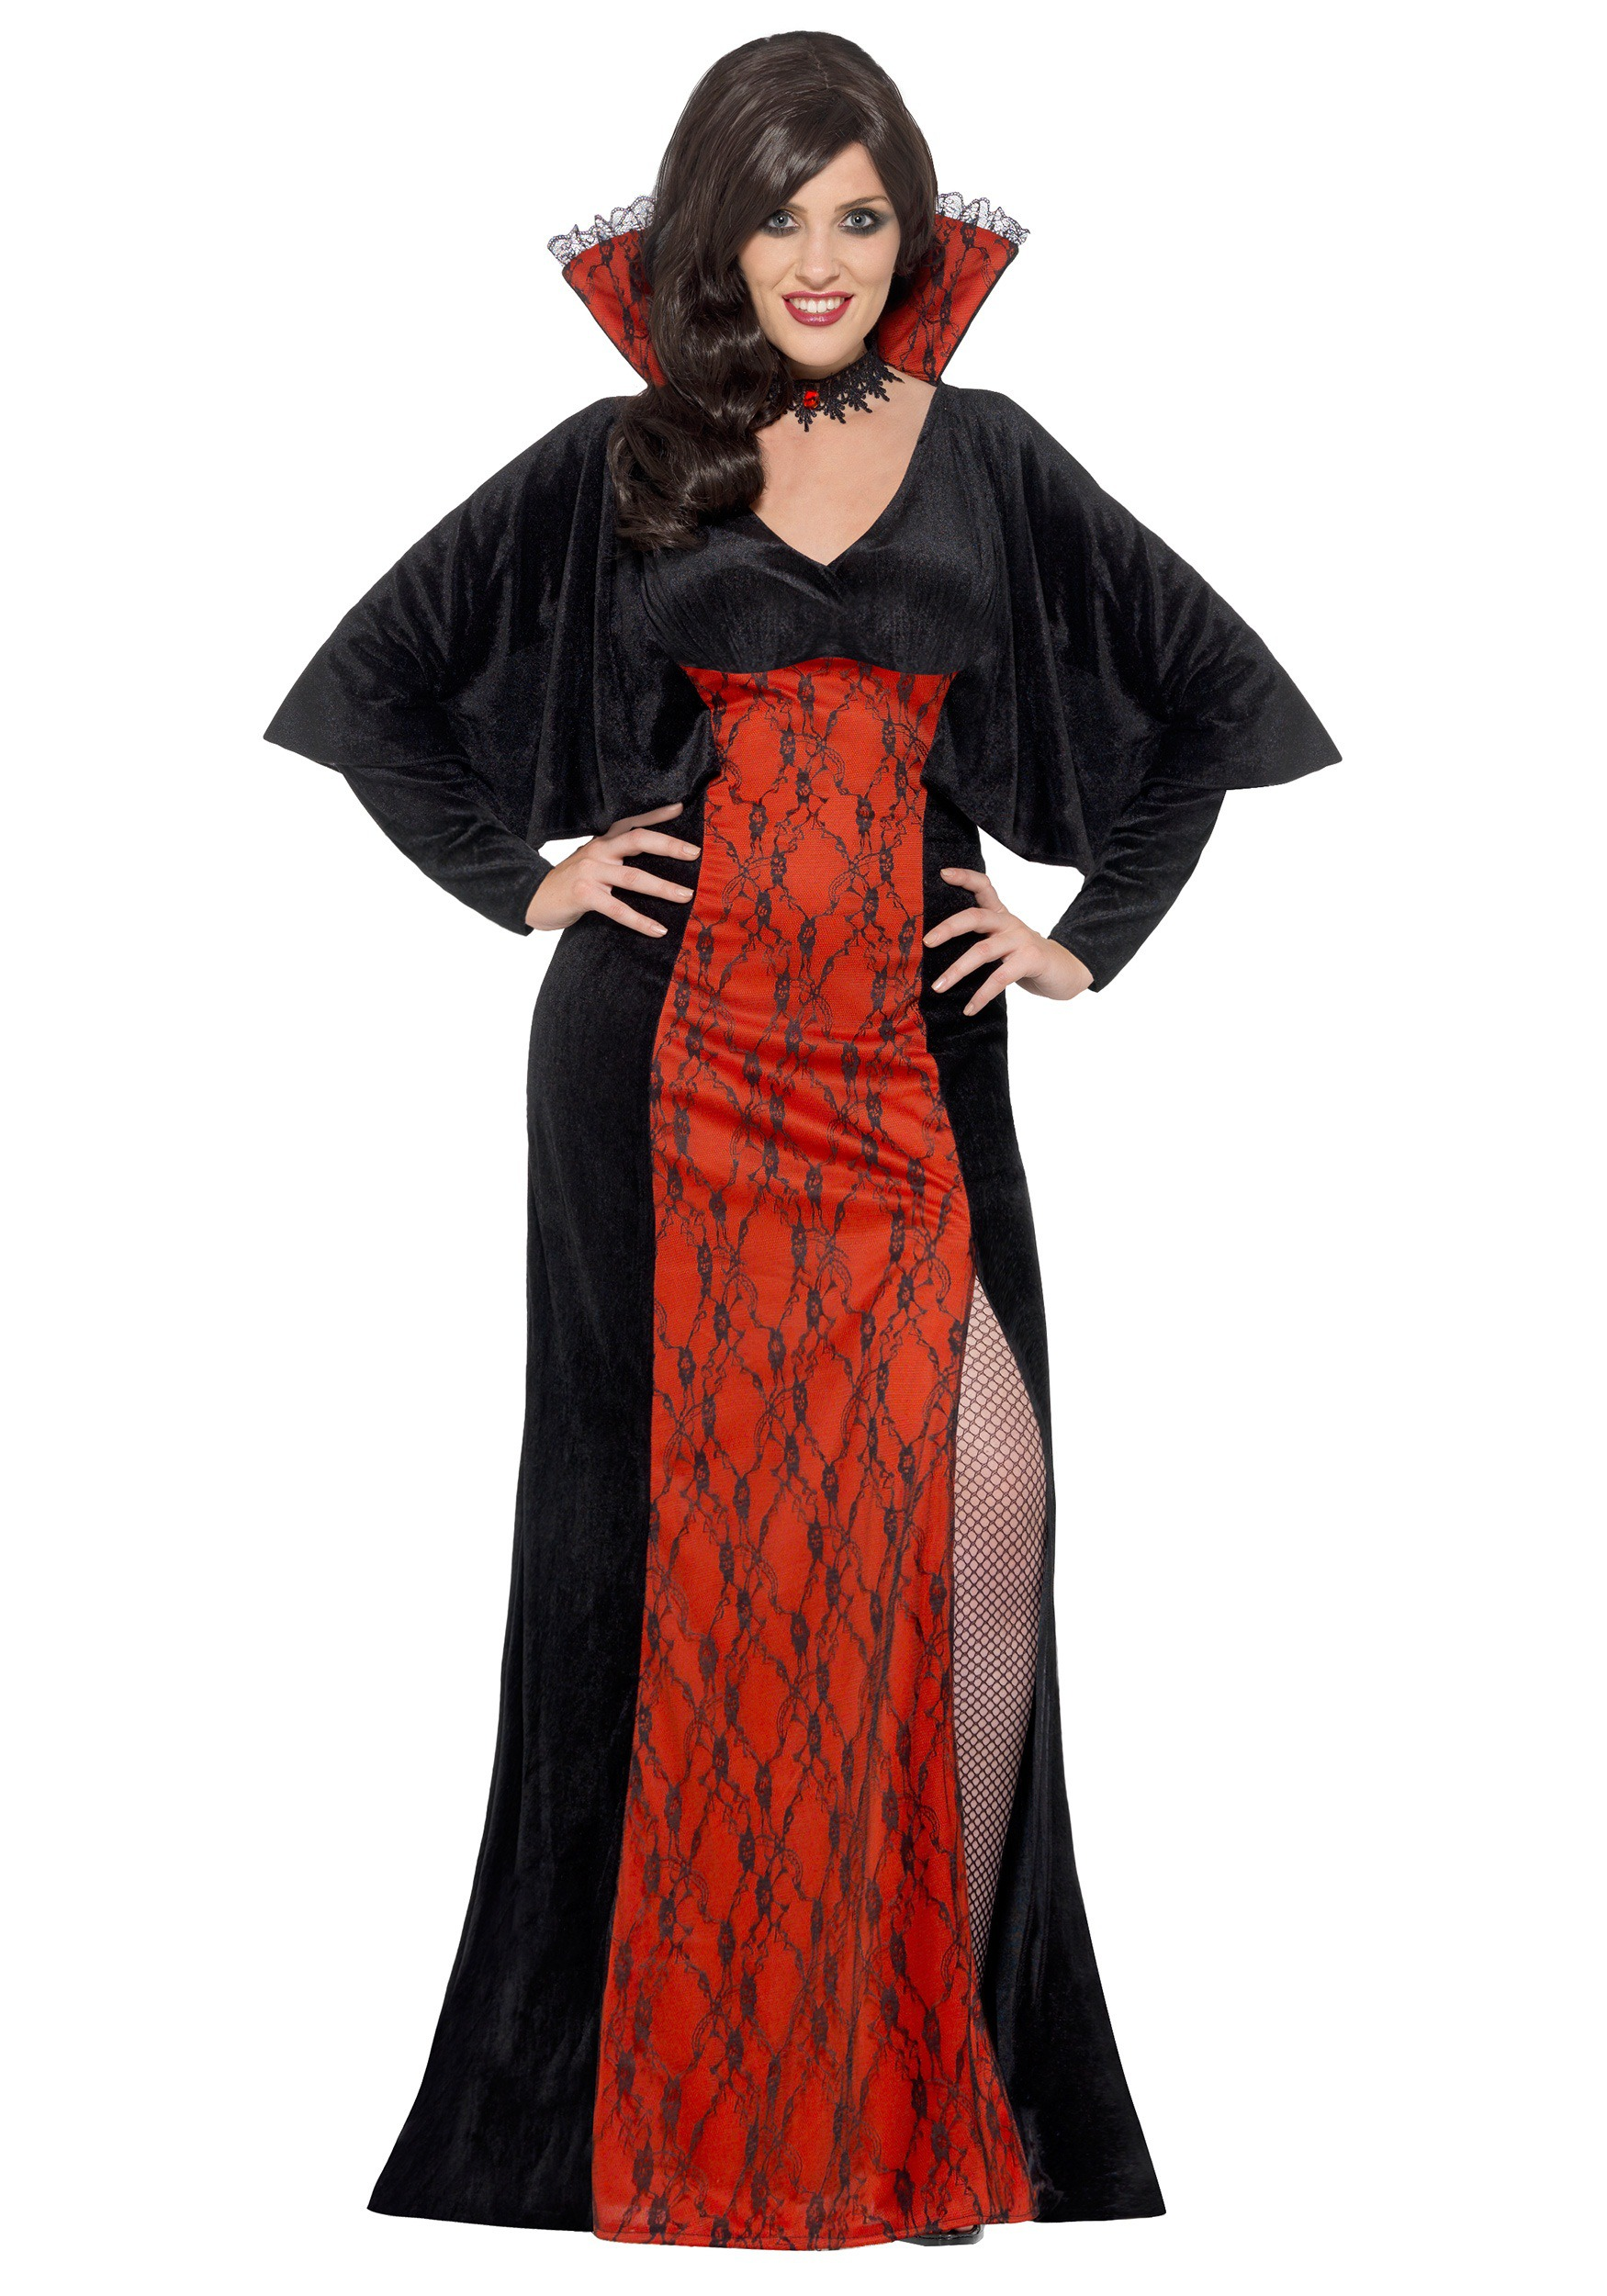 Elvira Plus Costume - Scary Plus Size Costumes